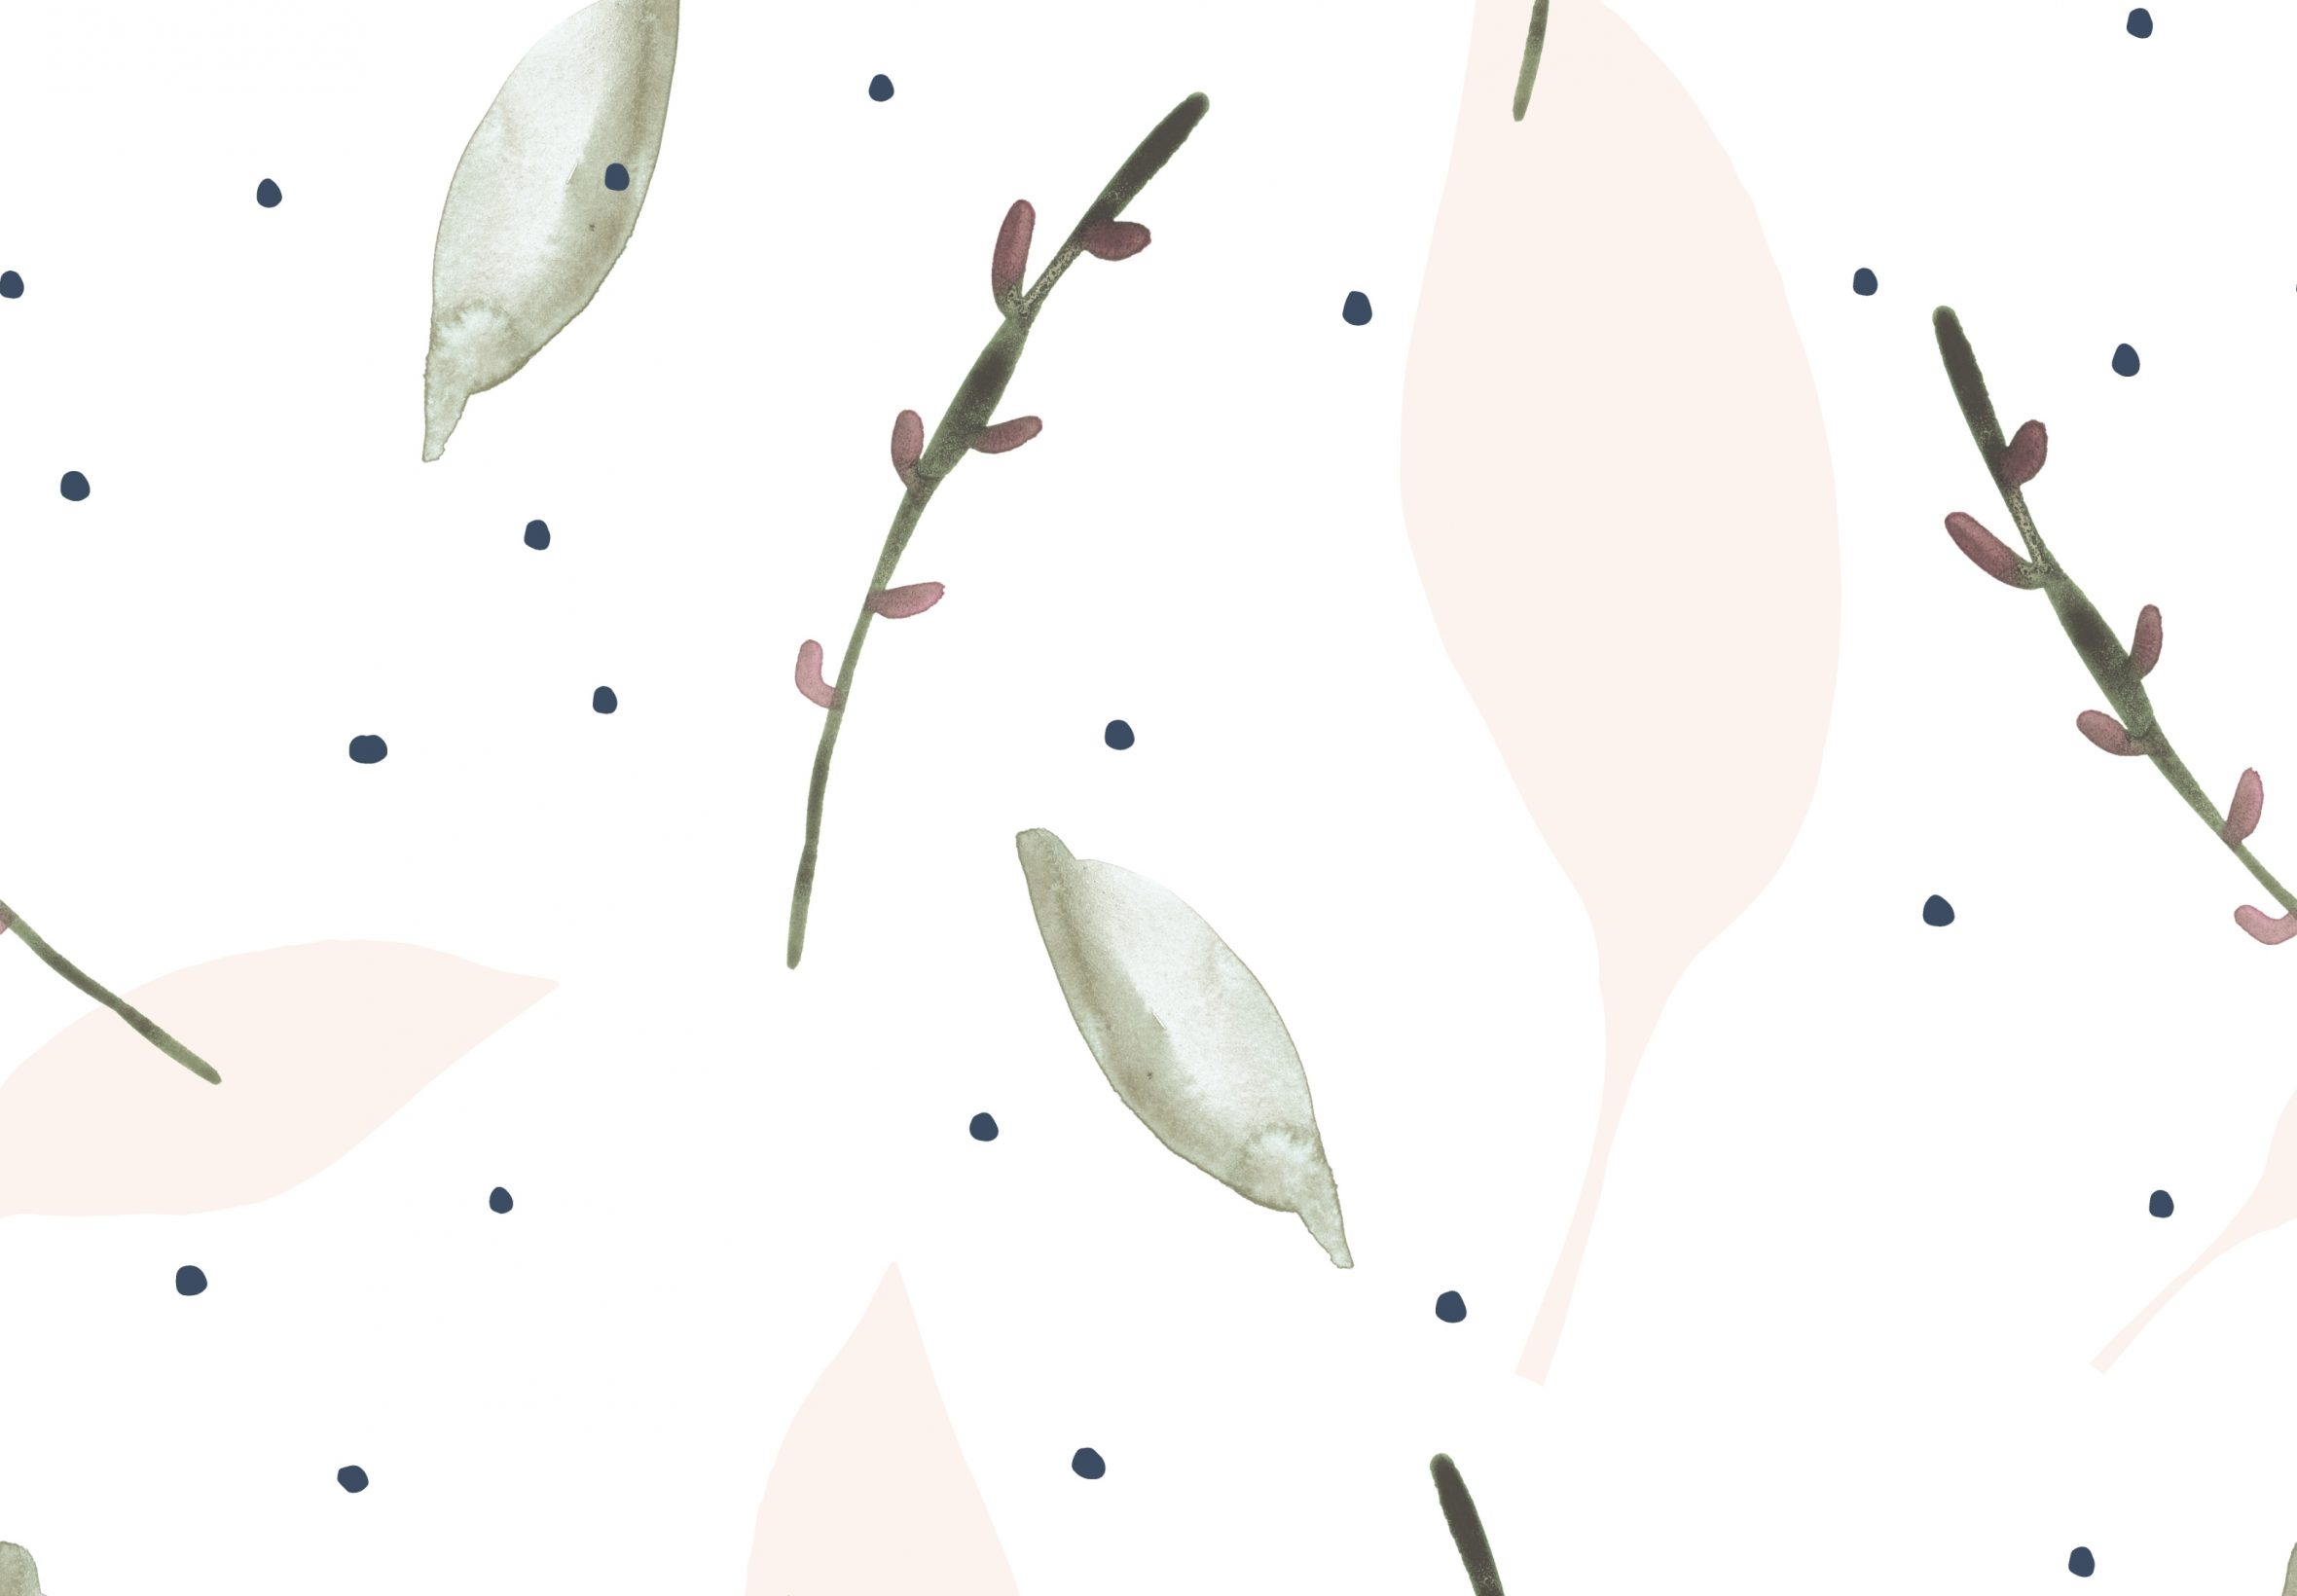 2360x1640 iPad Air wallpaper 4k Floral Leaves Floating Abstract iPad Wallpaper 2360x1640 pixels resolution